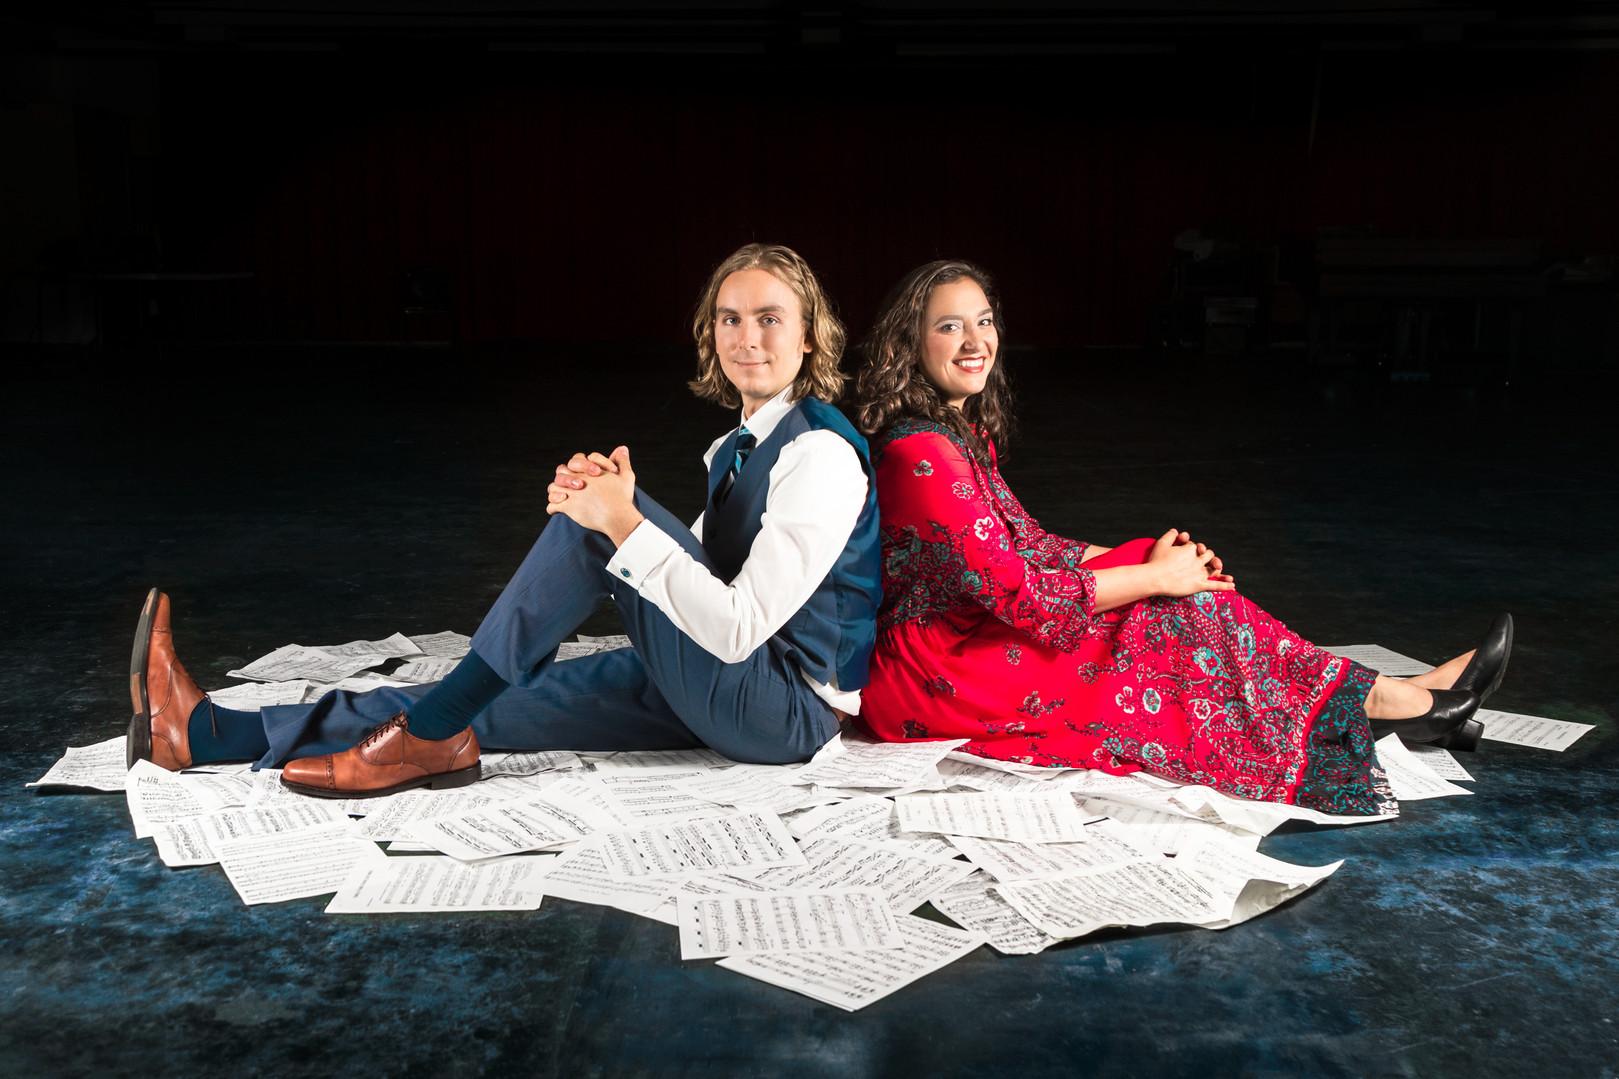 Matt and Vlada pages floor.jpg